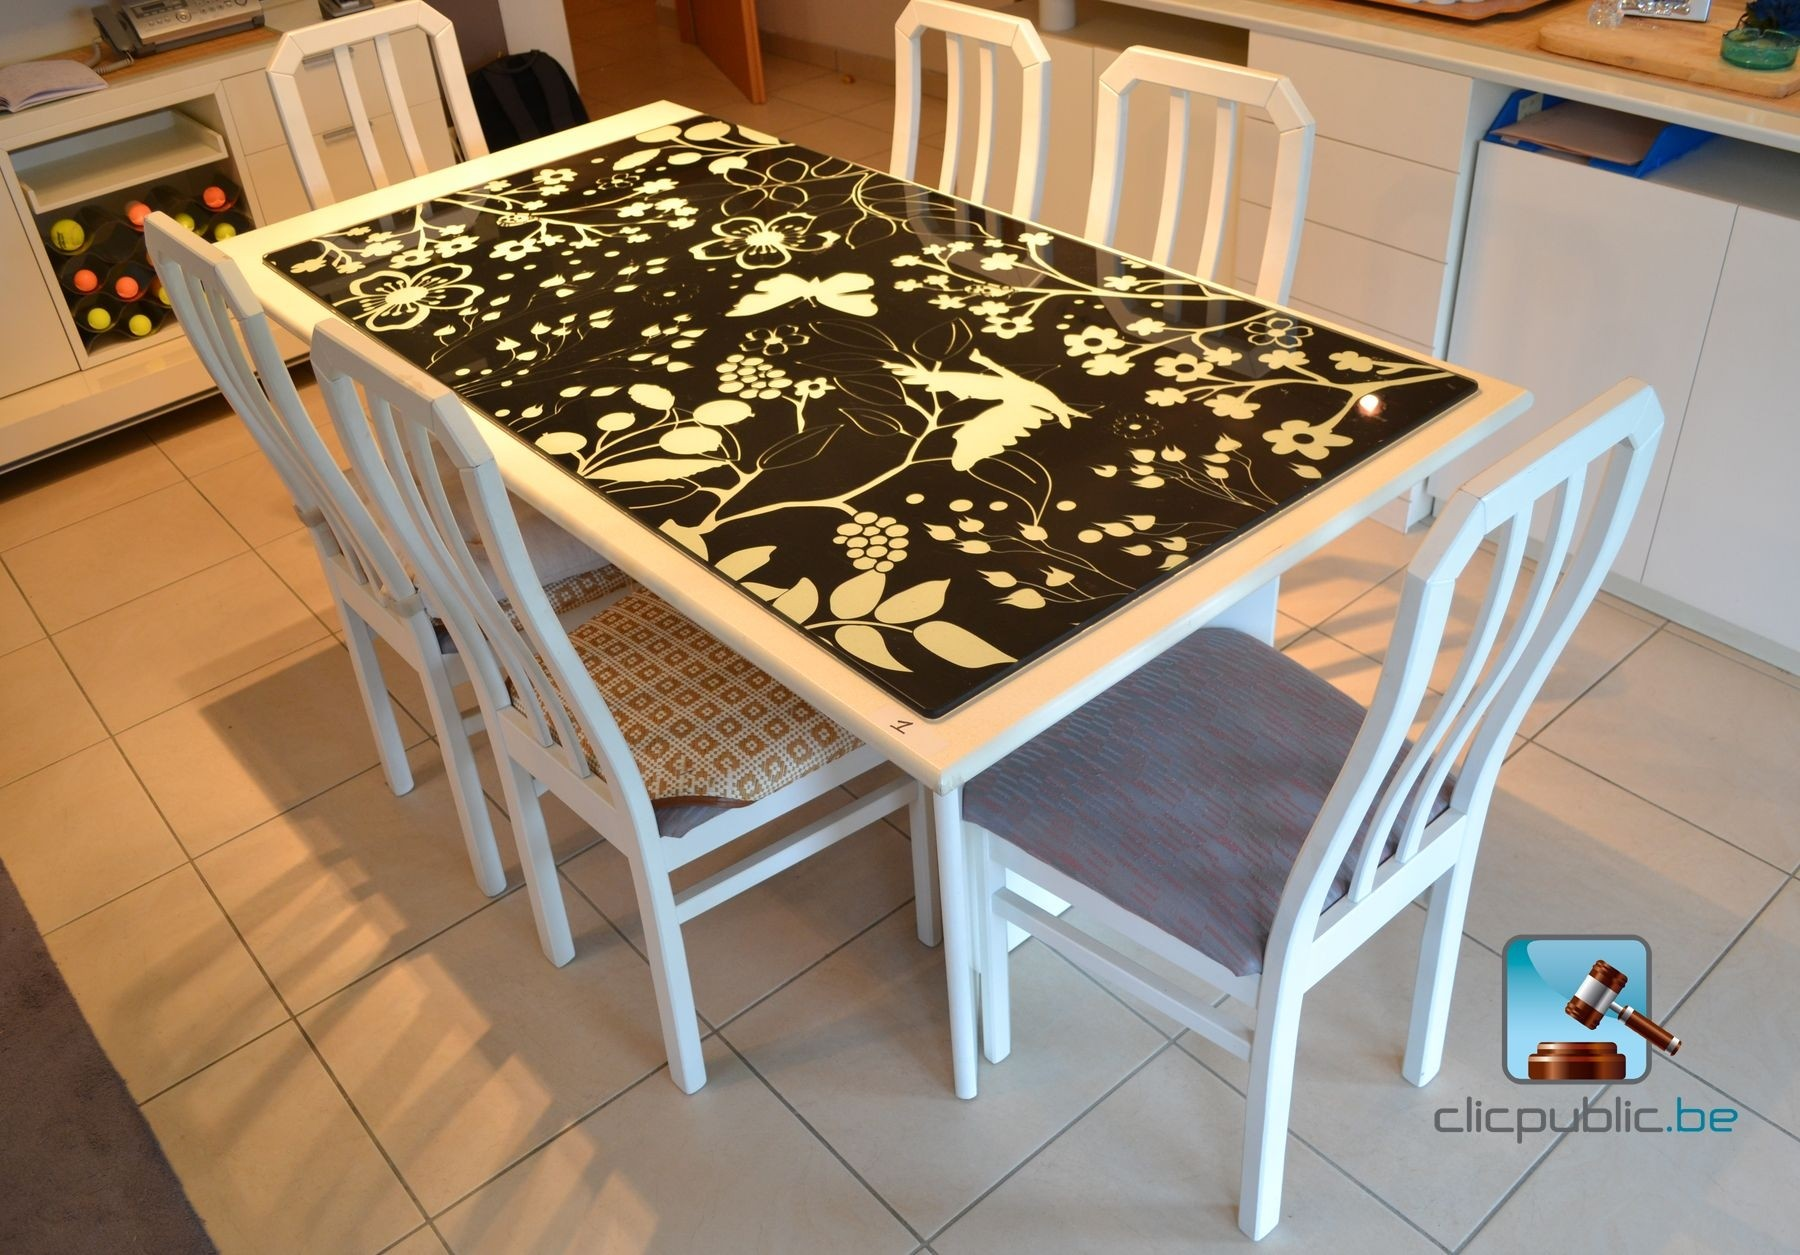 Mobilier de salle manger ref 1 vendre sur for Mobilier de salle a manger